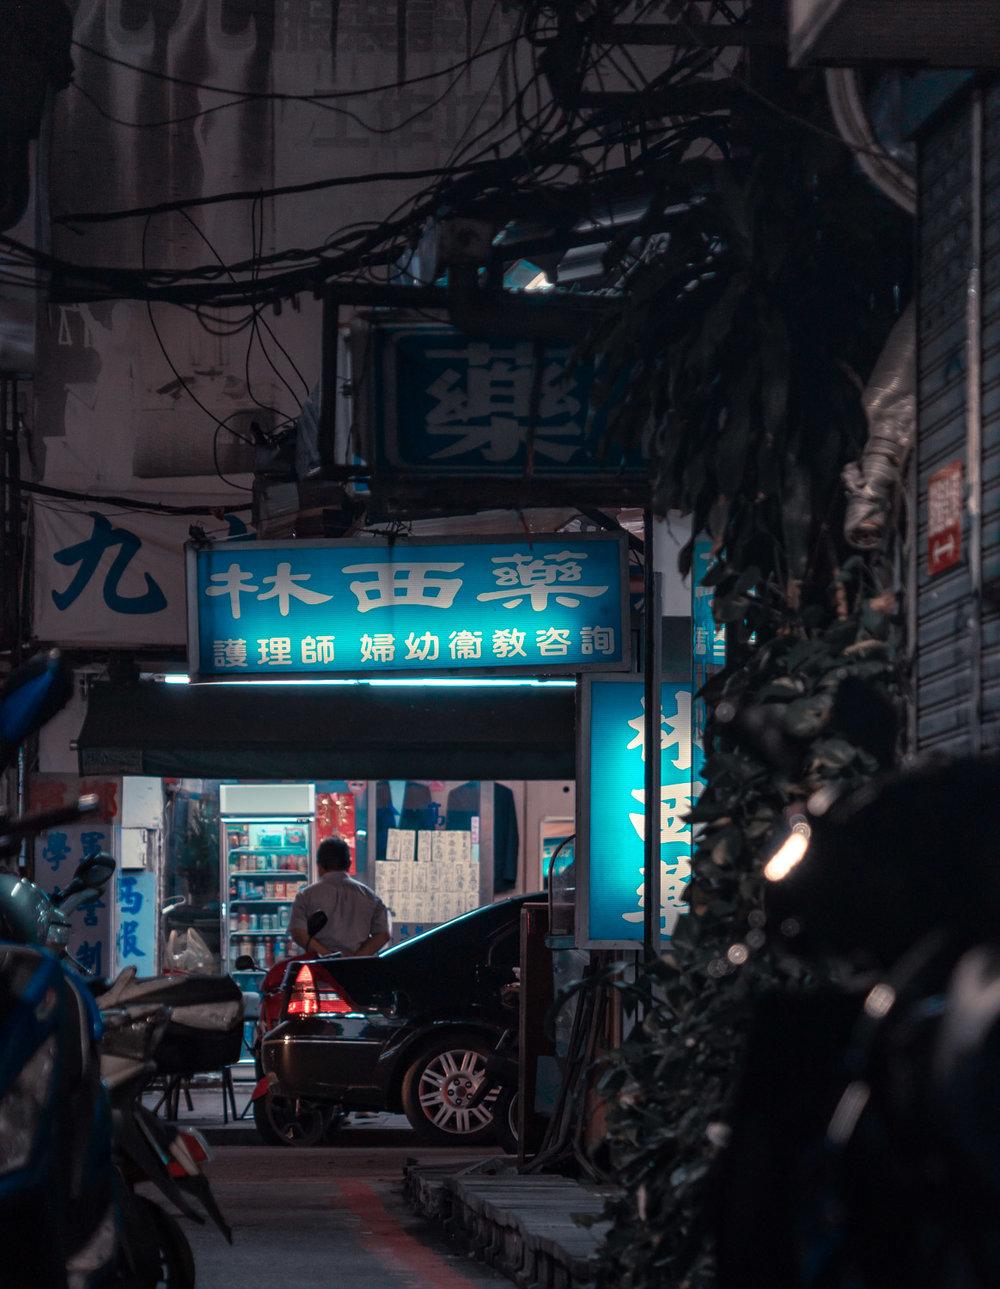 amaris-woo-photography-jiufen-taiwan